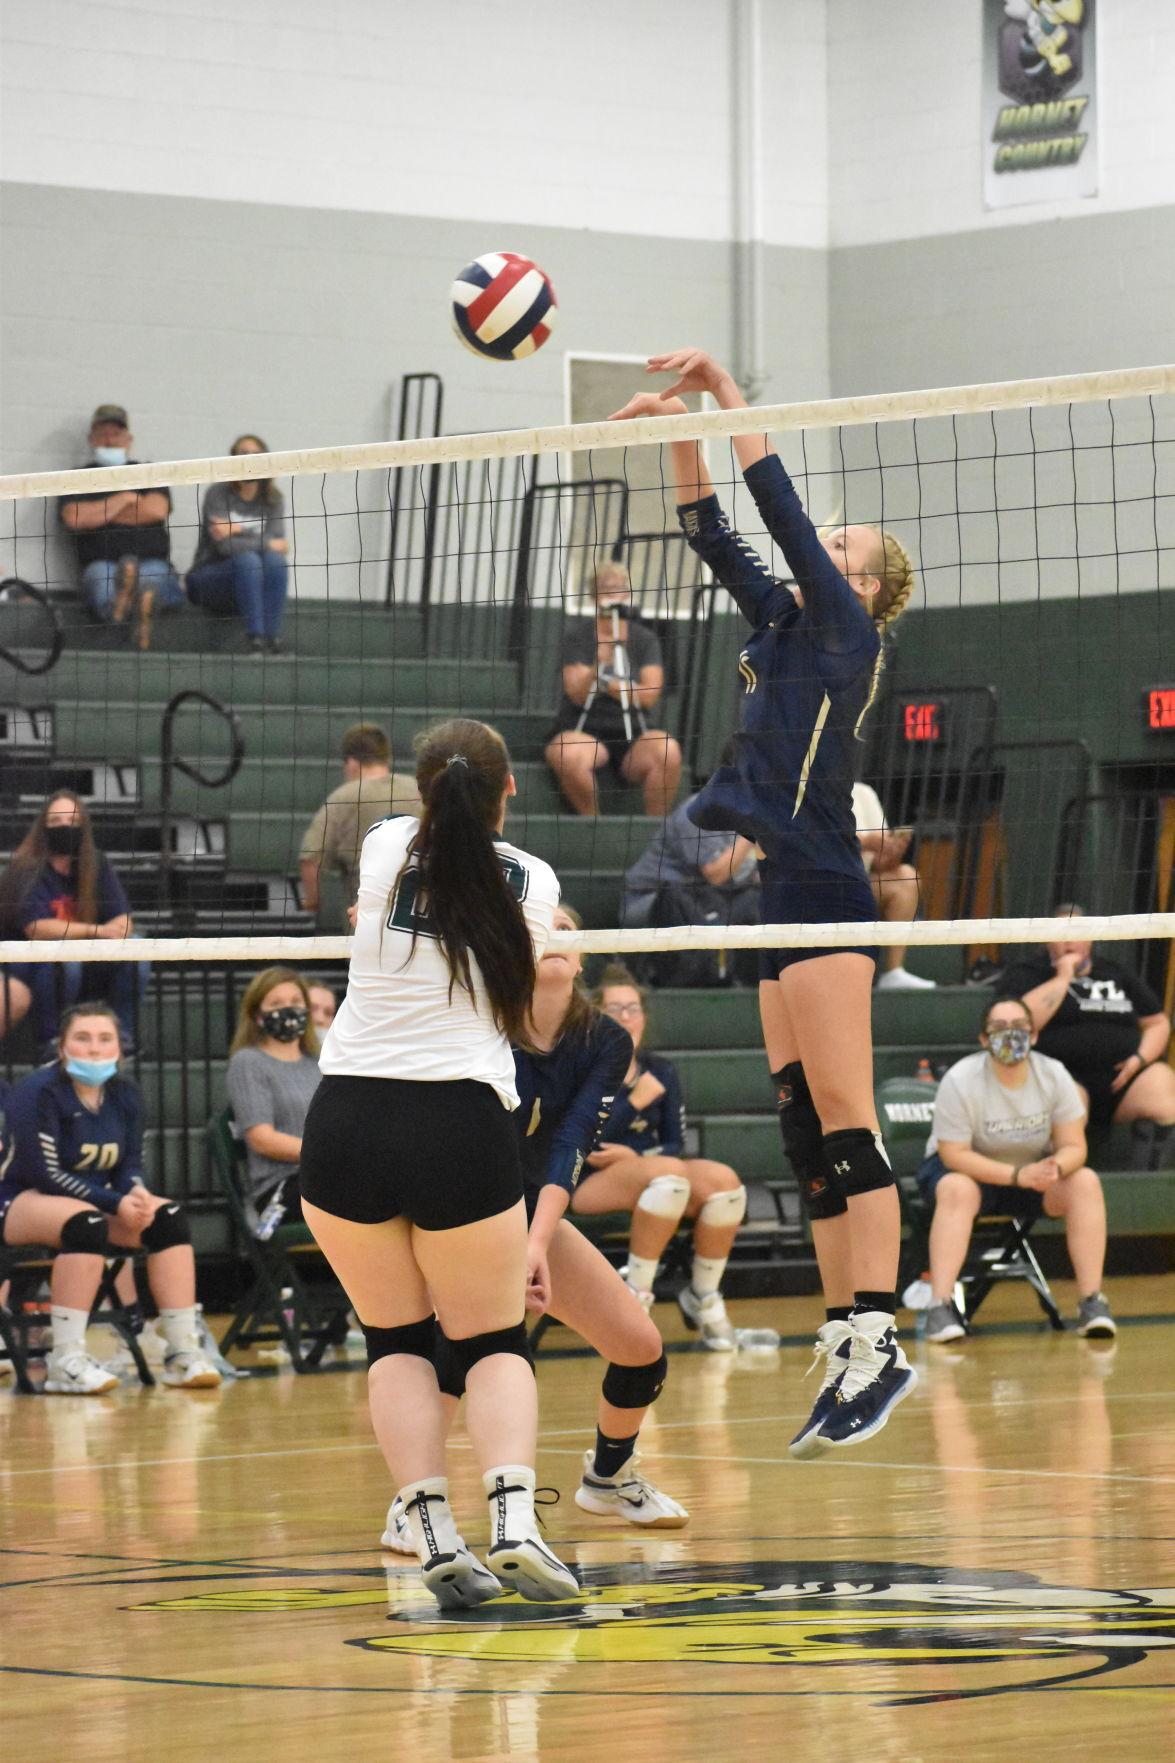 Williamson vs. Wellsboro volleyball